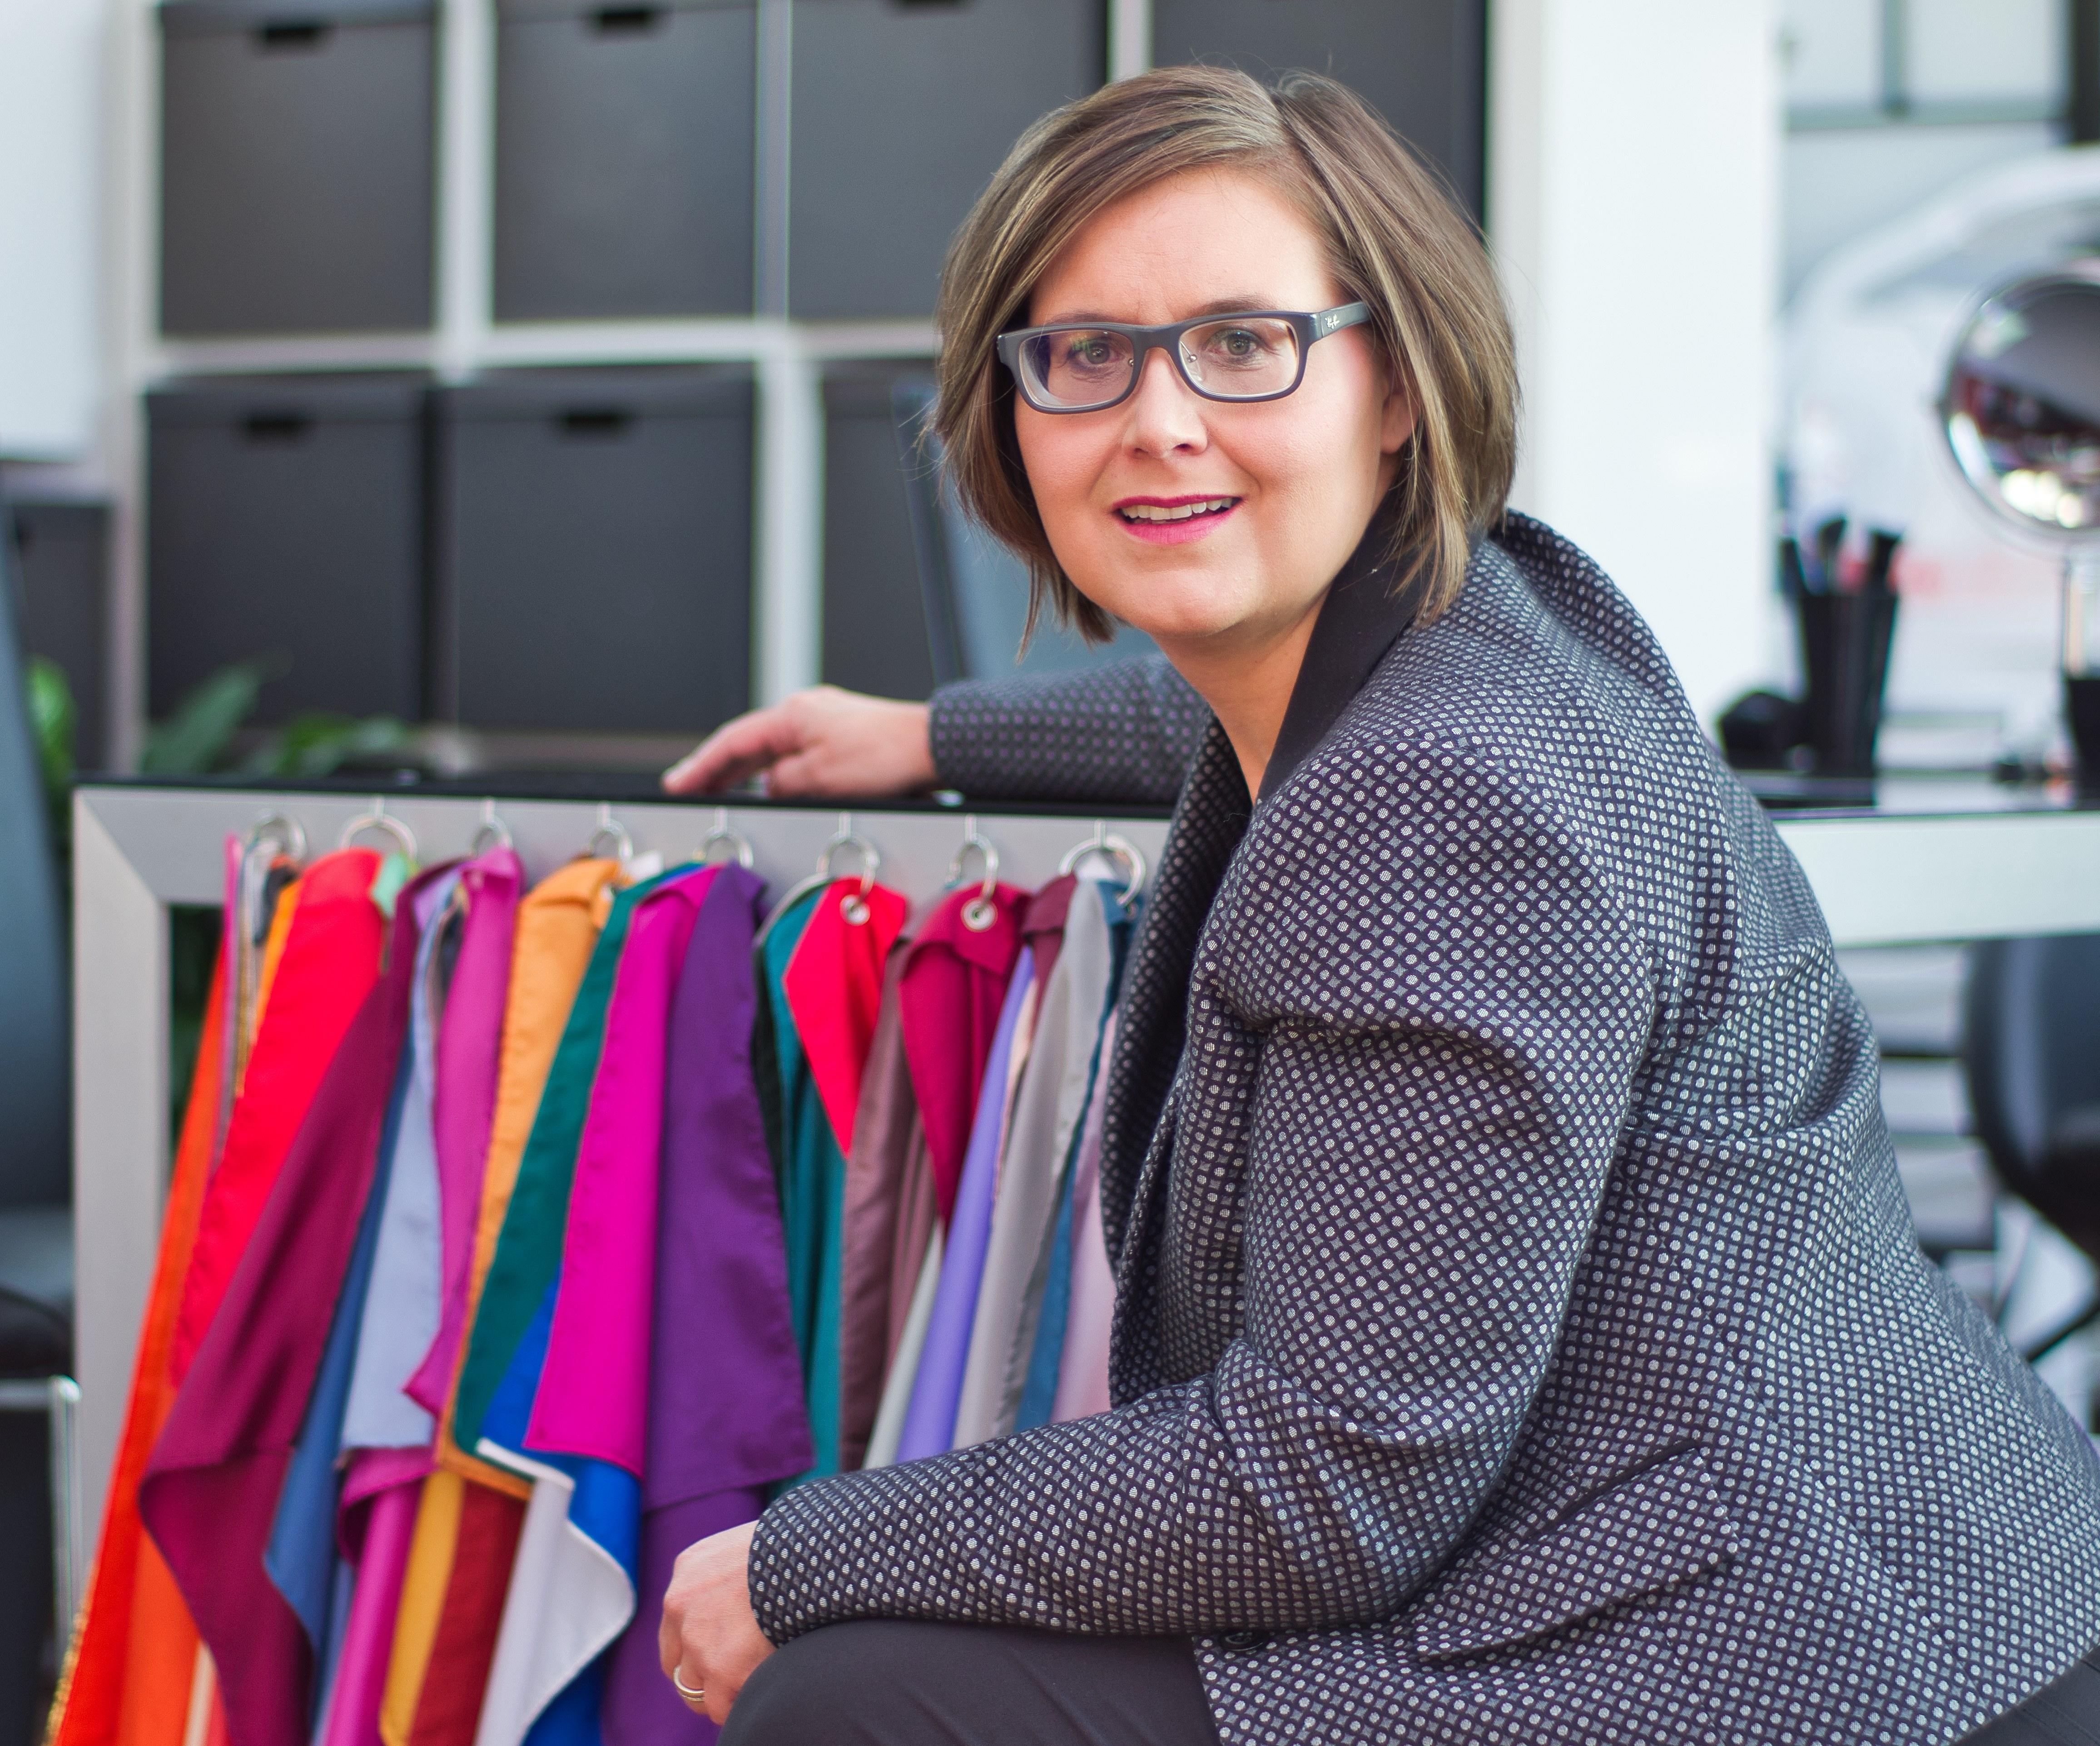 Claudia Hansen - Farb- und Stilberatung